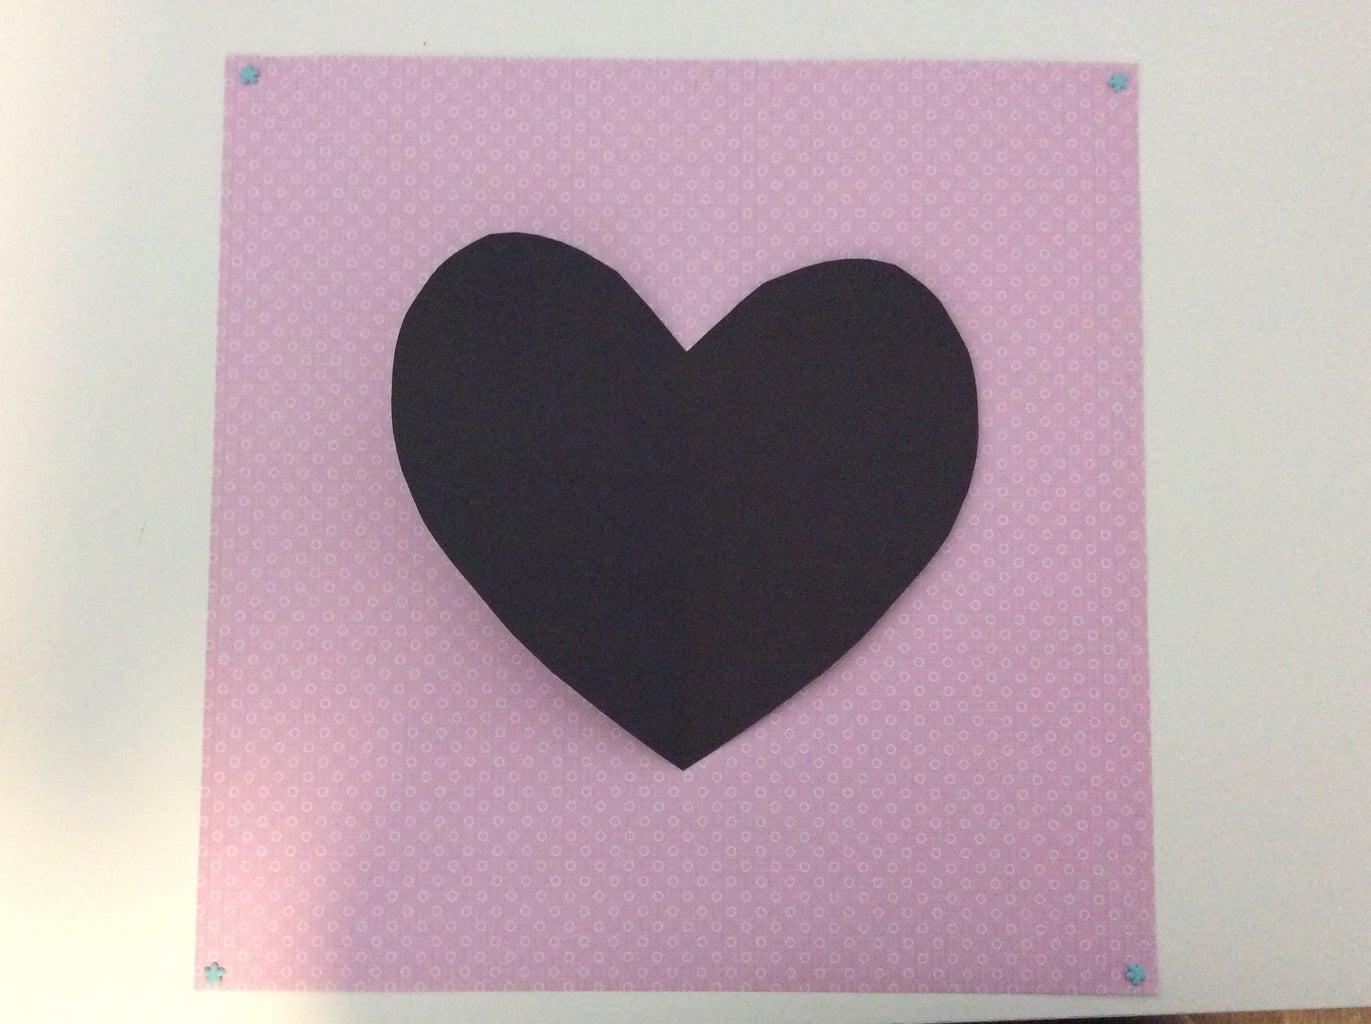 Paper Heart Outline